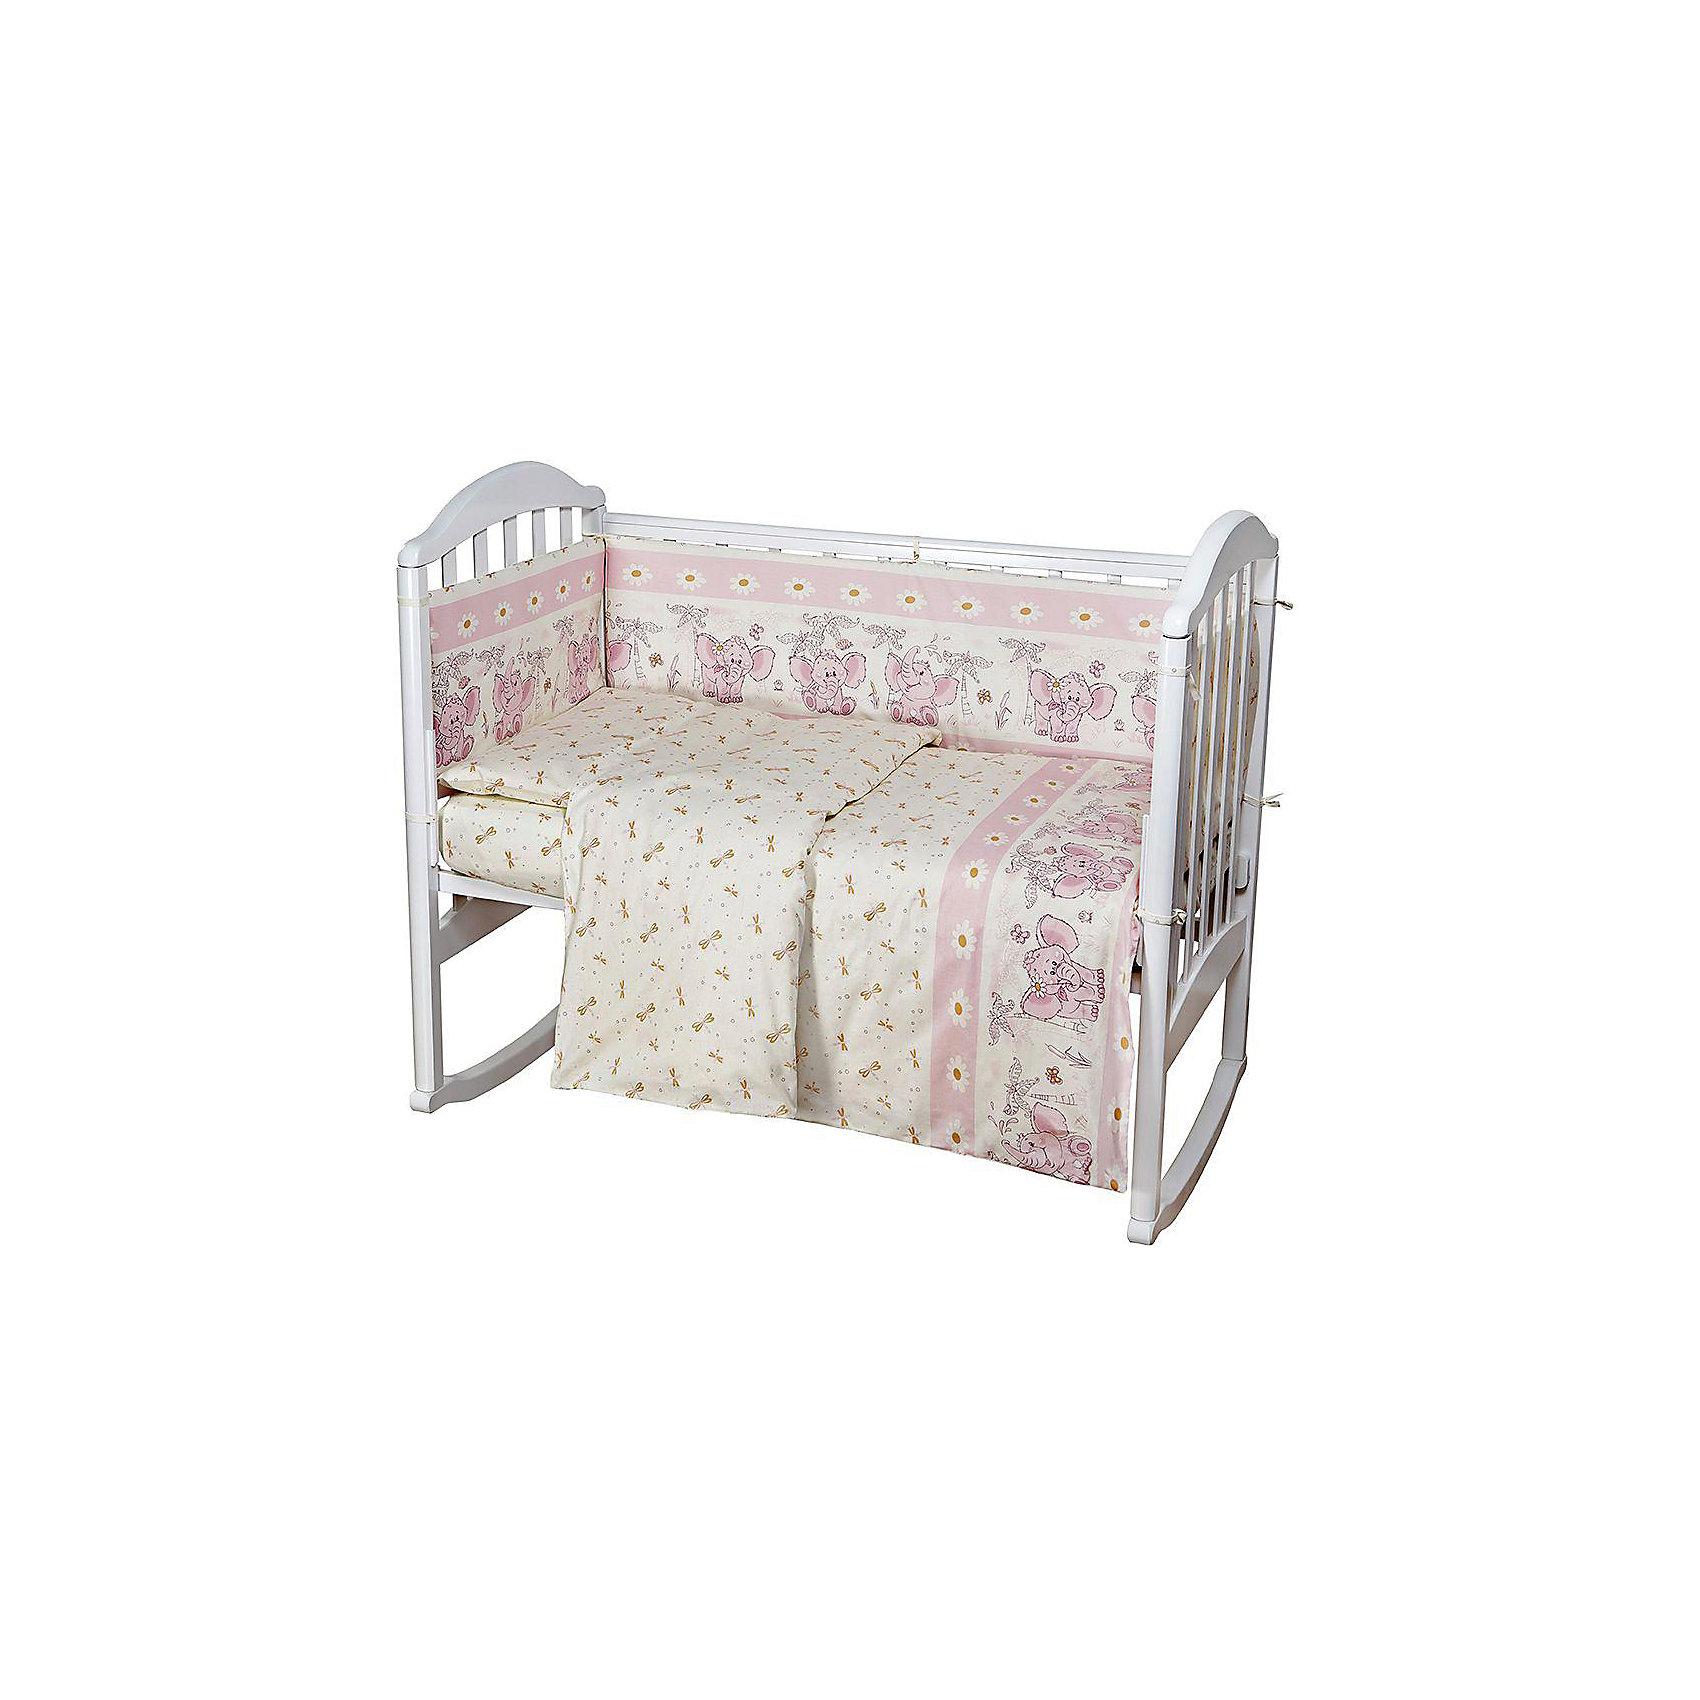 Baby Nice Постельное белье Слоник 6 пред., Baby Nice, розовый baby nice постельное белье ежик 3 пред бязь 60х120 baby nice